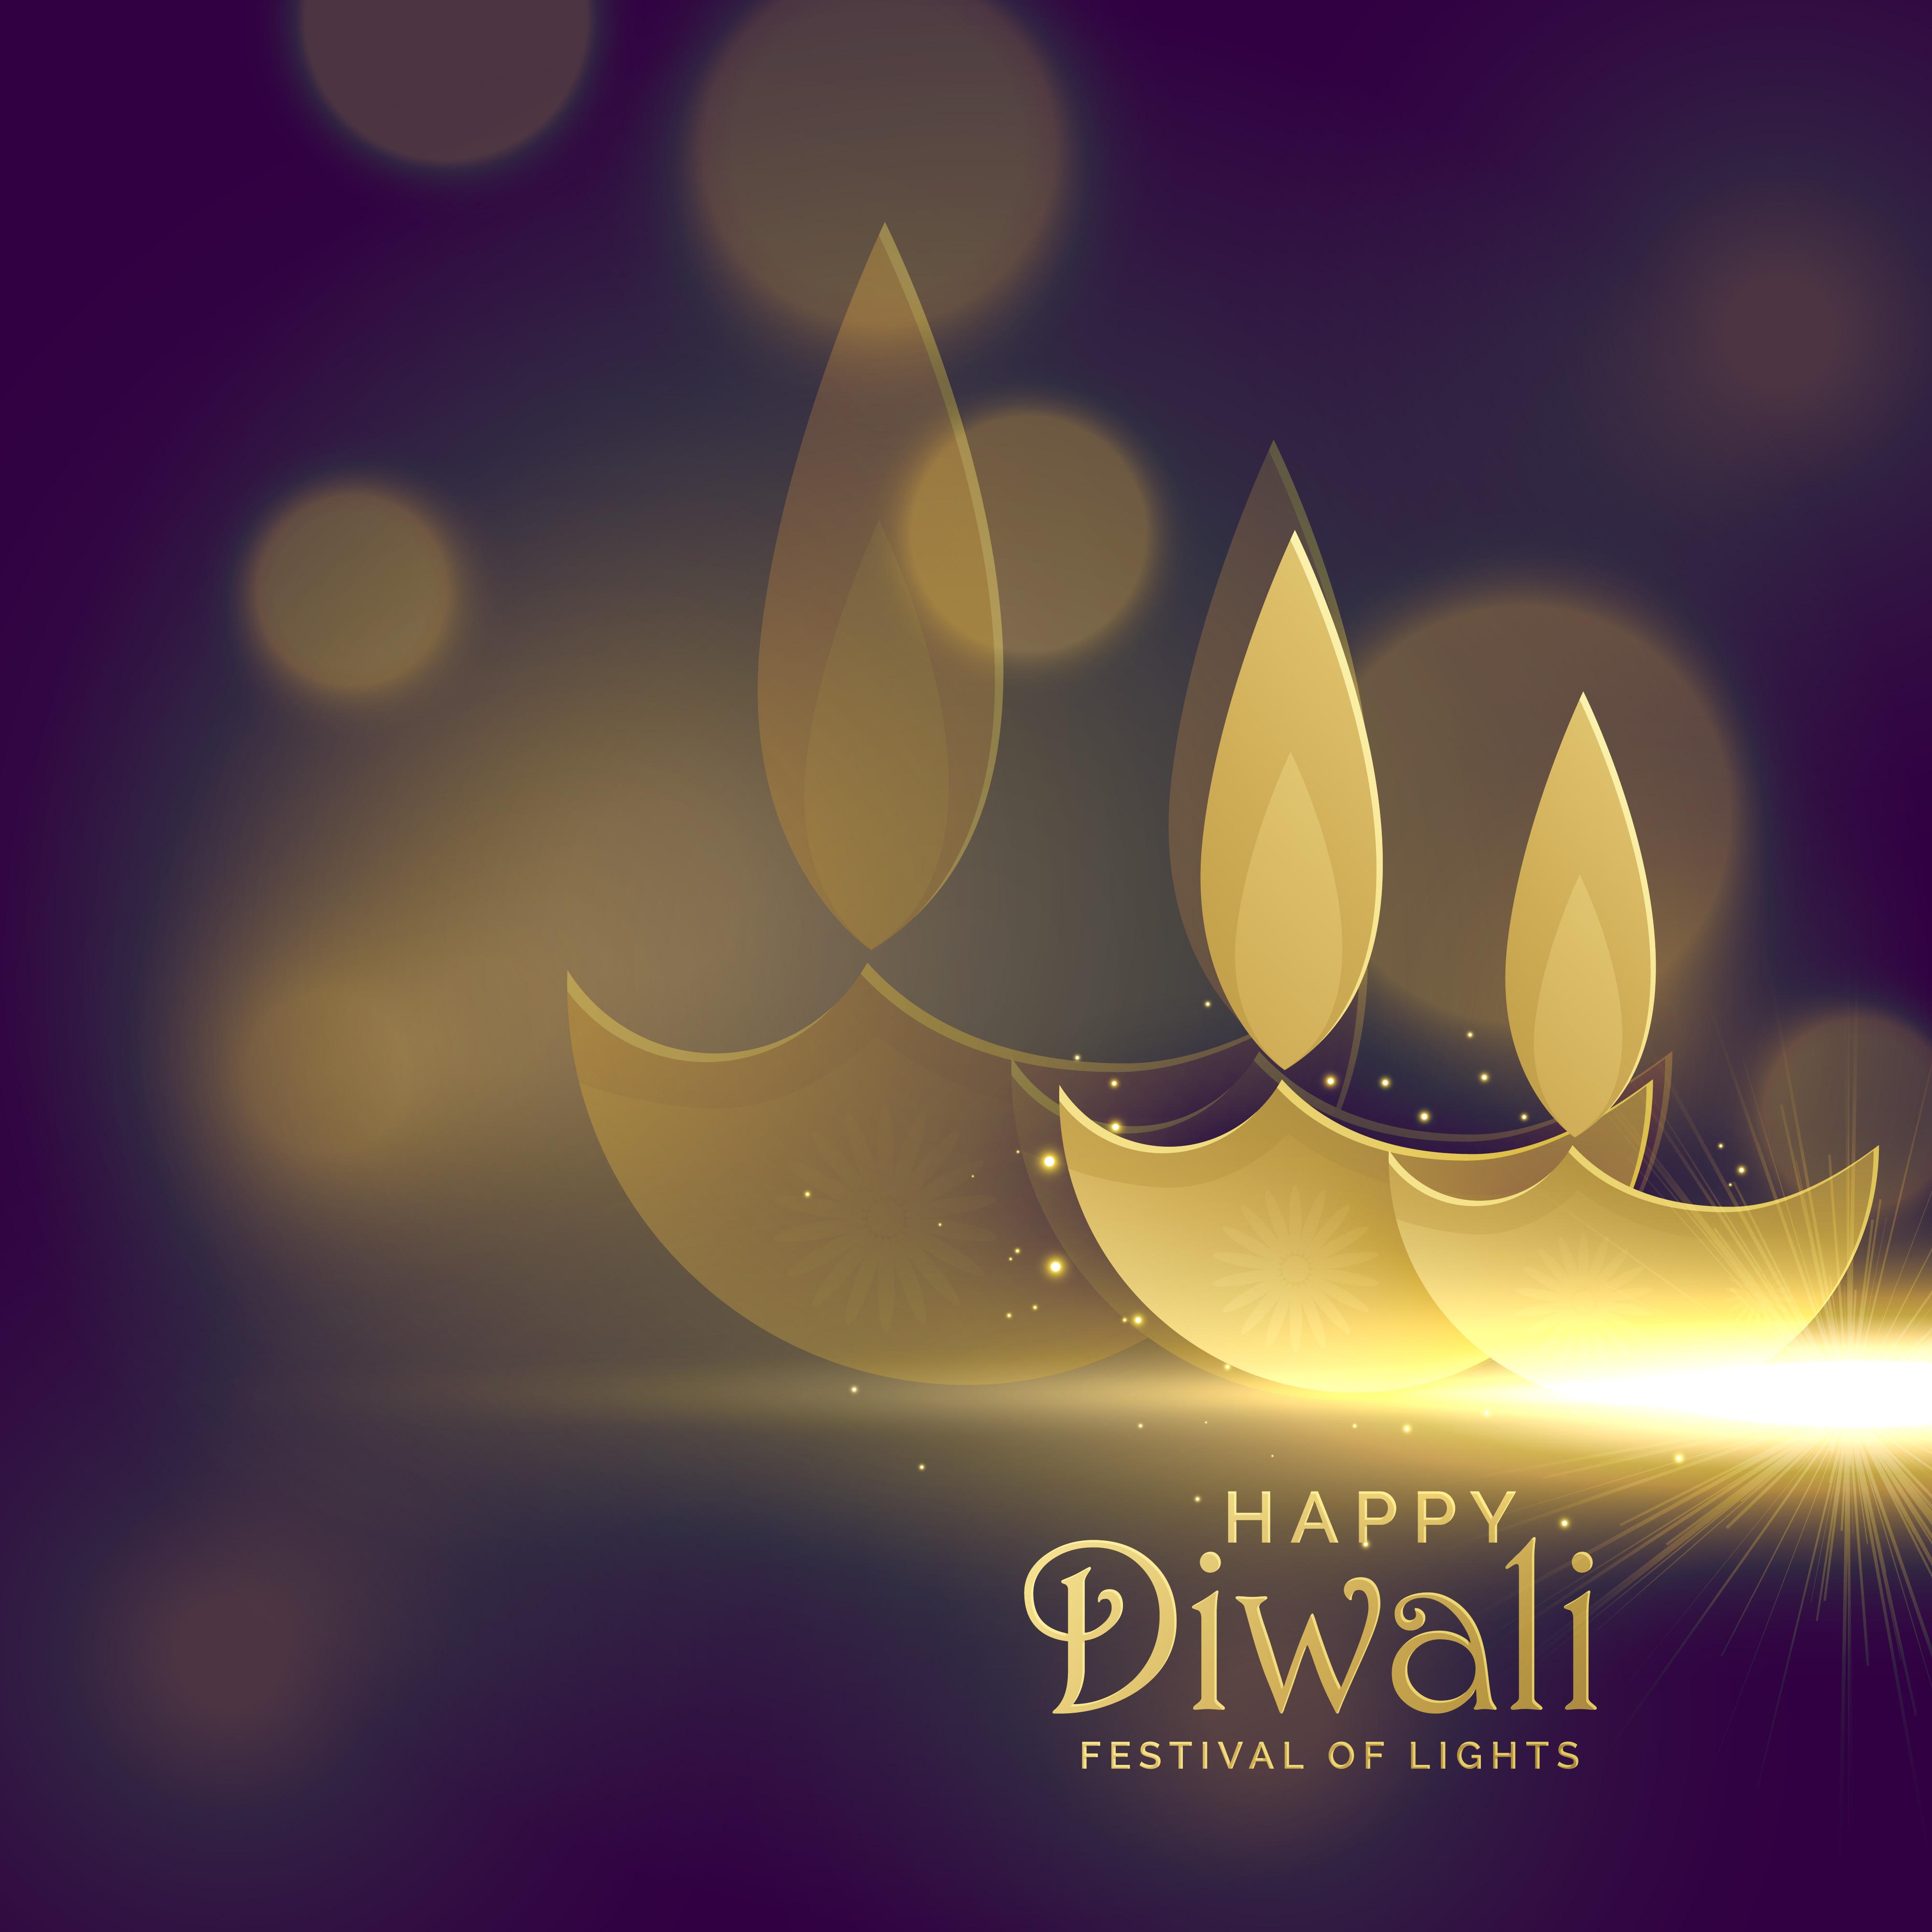 creative golden diwali diya with glowing light effect vector bac